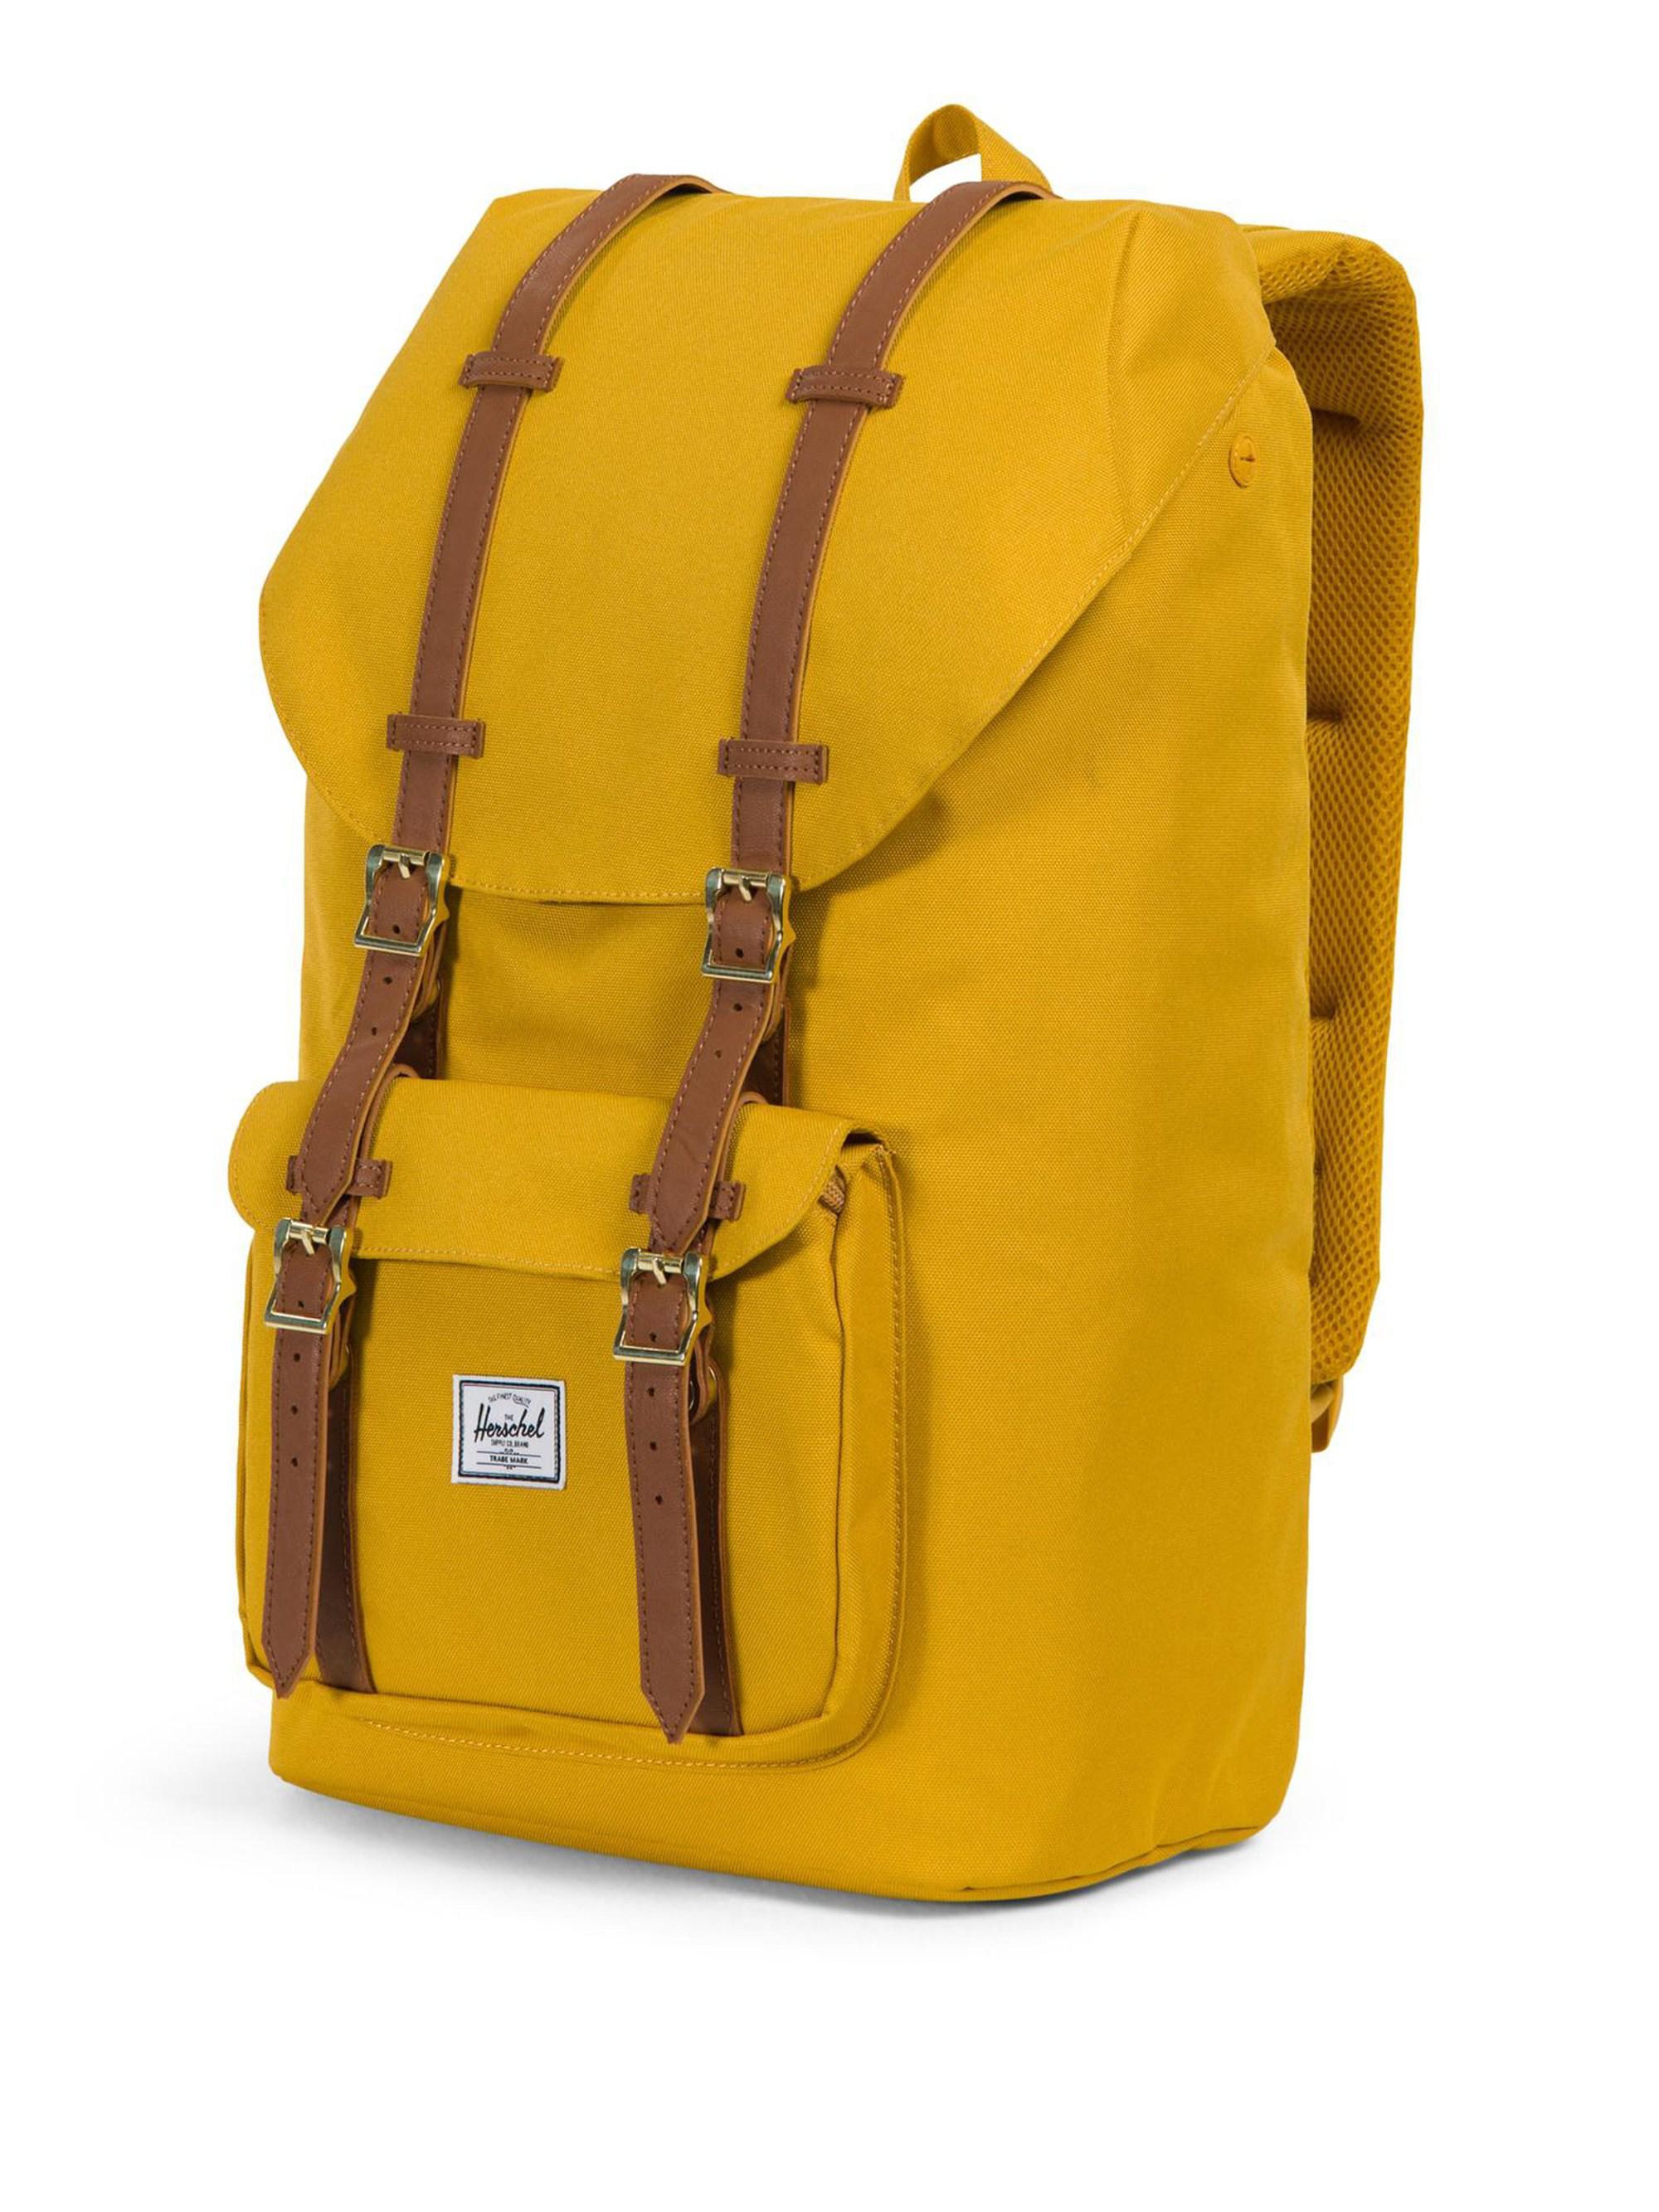 Herschel Supply Co. Little America Backpack in Yellow for Men - Lyst 0af0ee242b